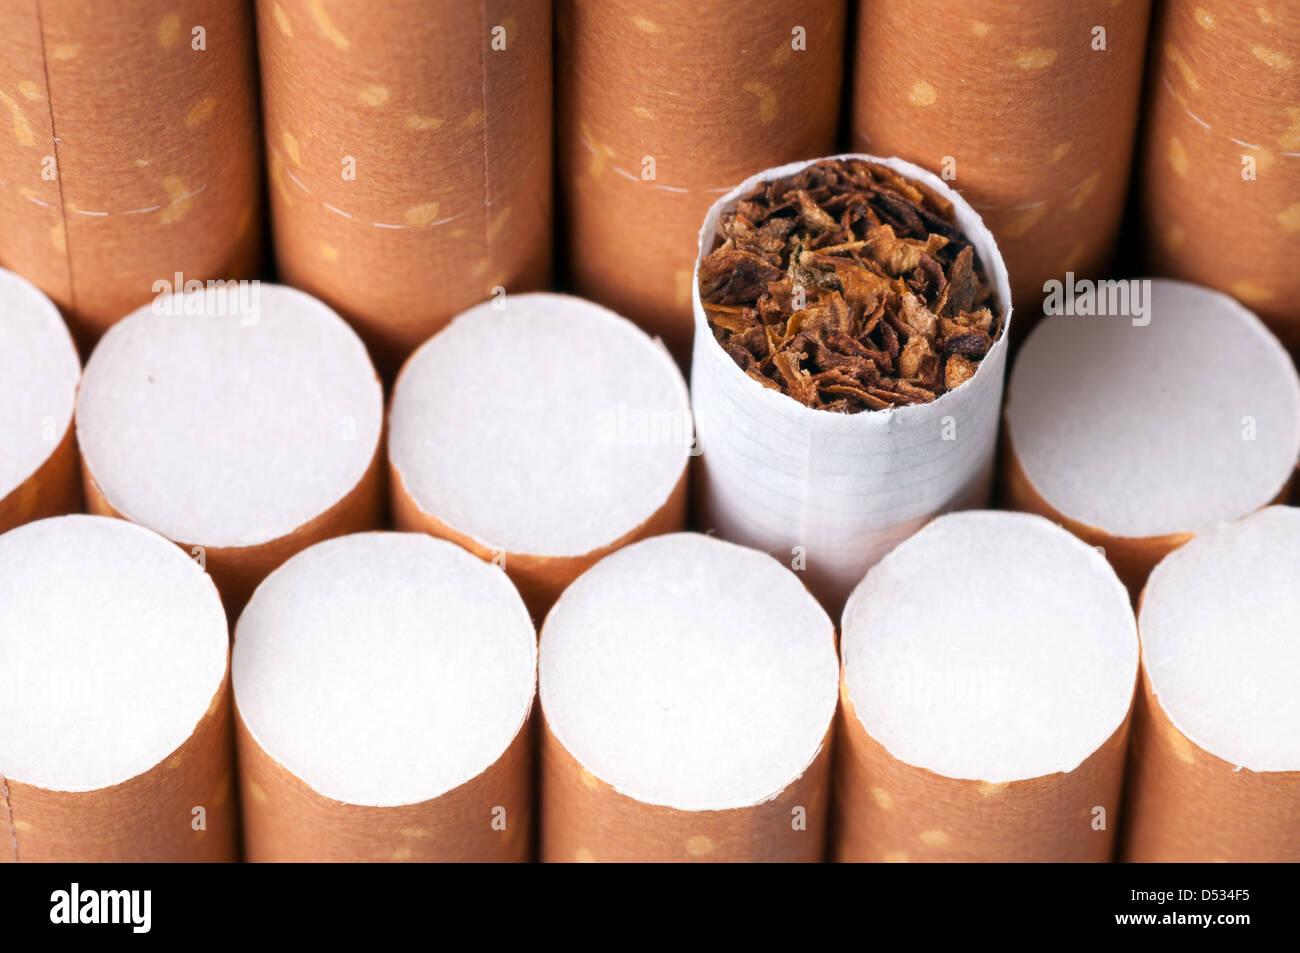 Tabak in Zigaretten mit einem braunen Filter hautnah Stockbild